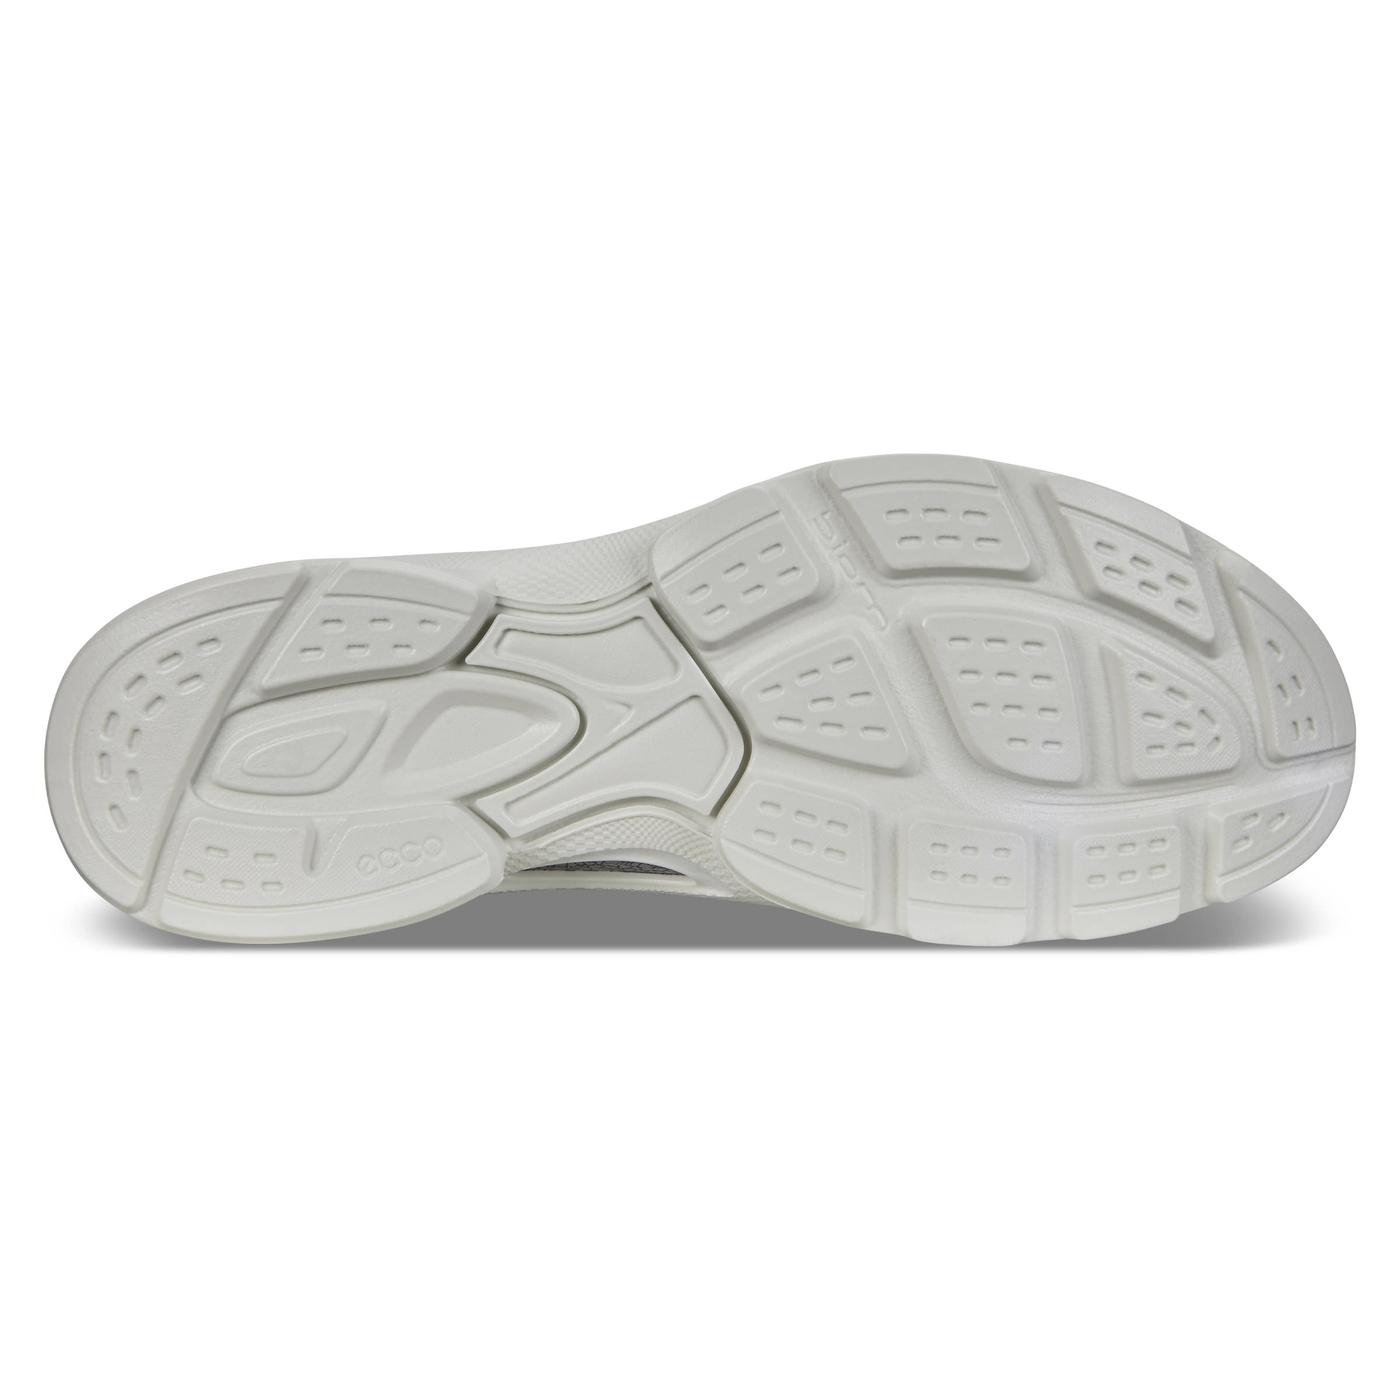 46a6c6c40b0de7 ECCO Women s Biom Street Outdoor Shoe